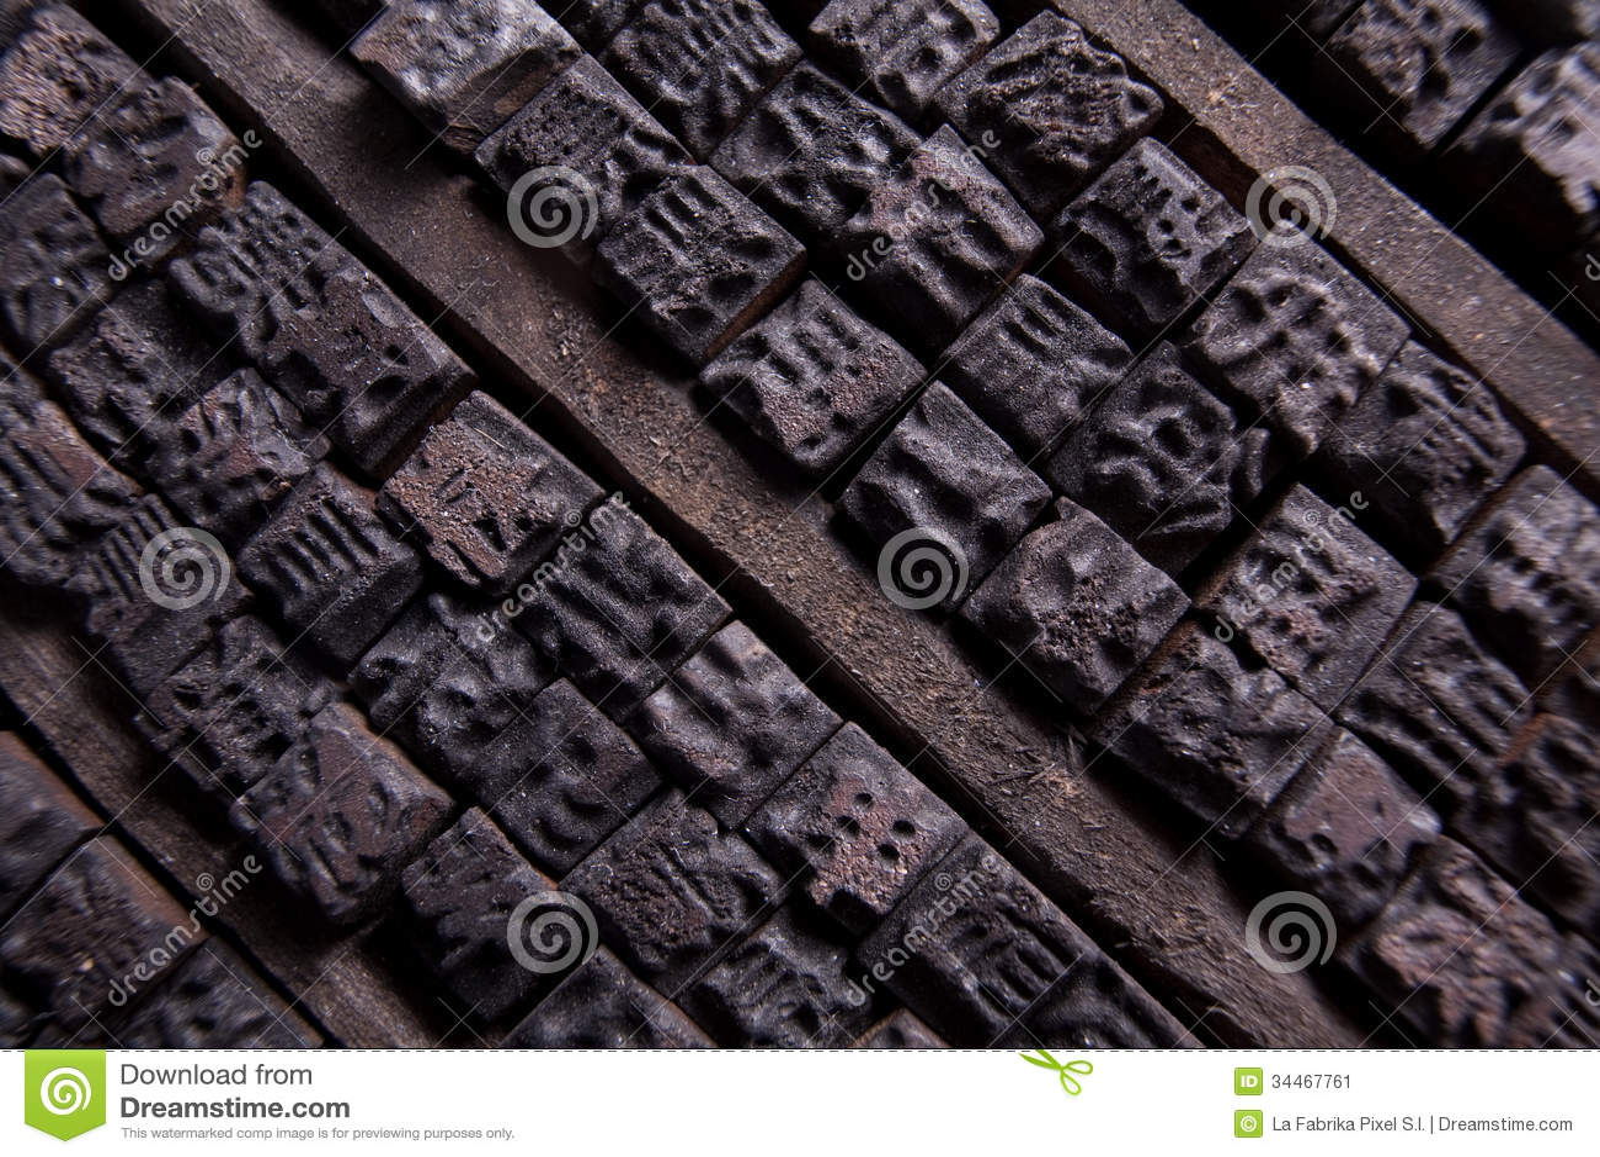 chinese printing press